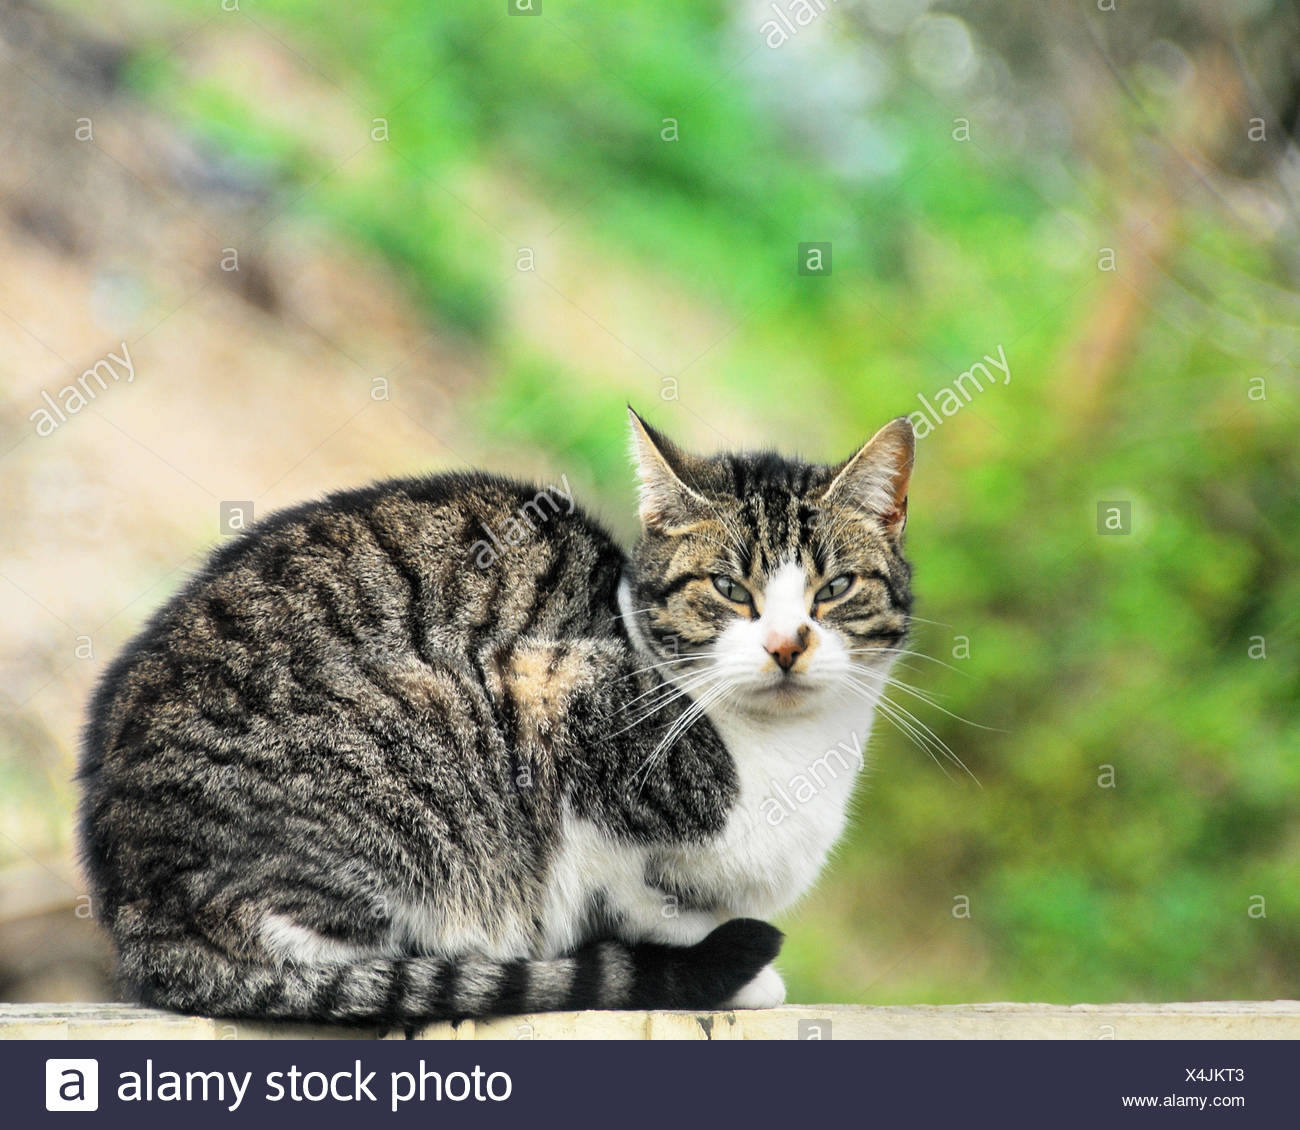 Portrait of sweet tabby cat - Stock Image